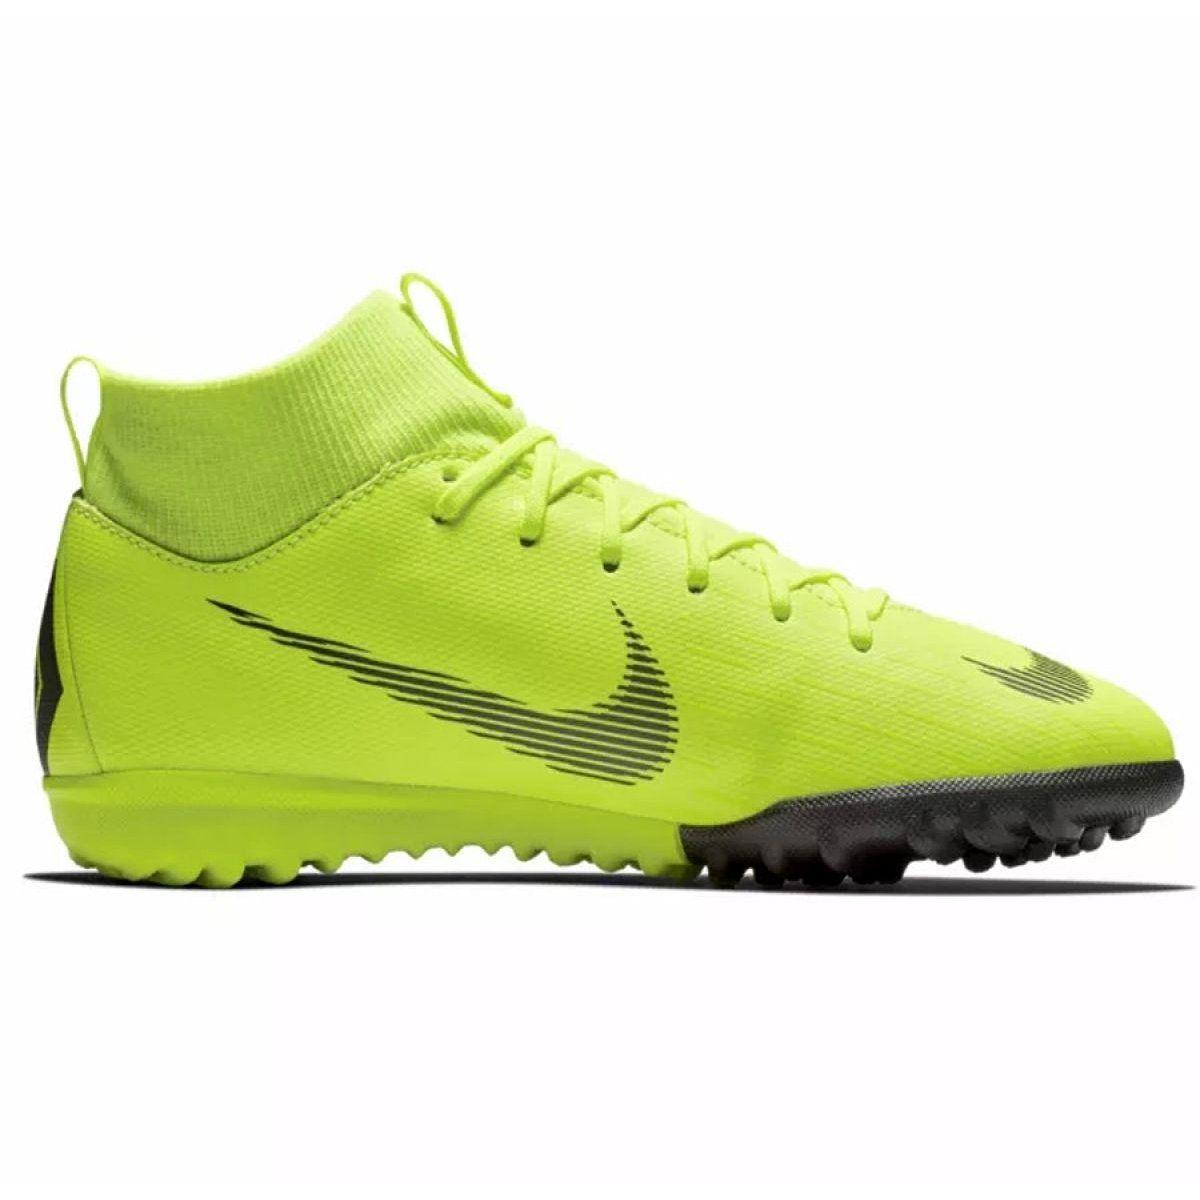 Buty Pilkarskie Nike Mercurial Superflyx 6 Academy Gs Tf Jr Ah7344 701 Zolte Zolte Football Boots Football Shoes Nike Football